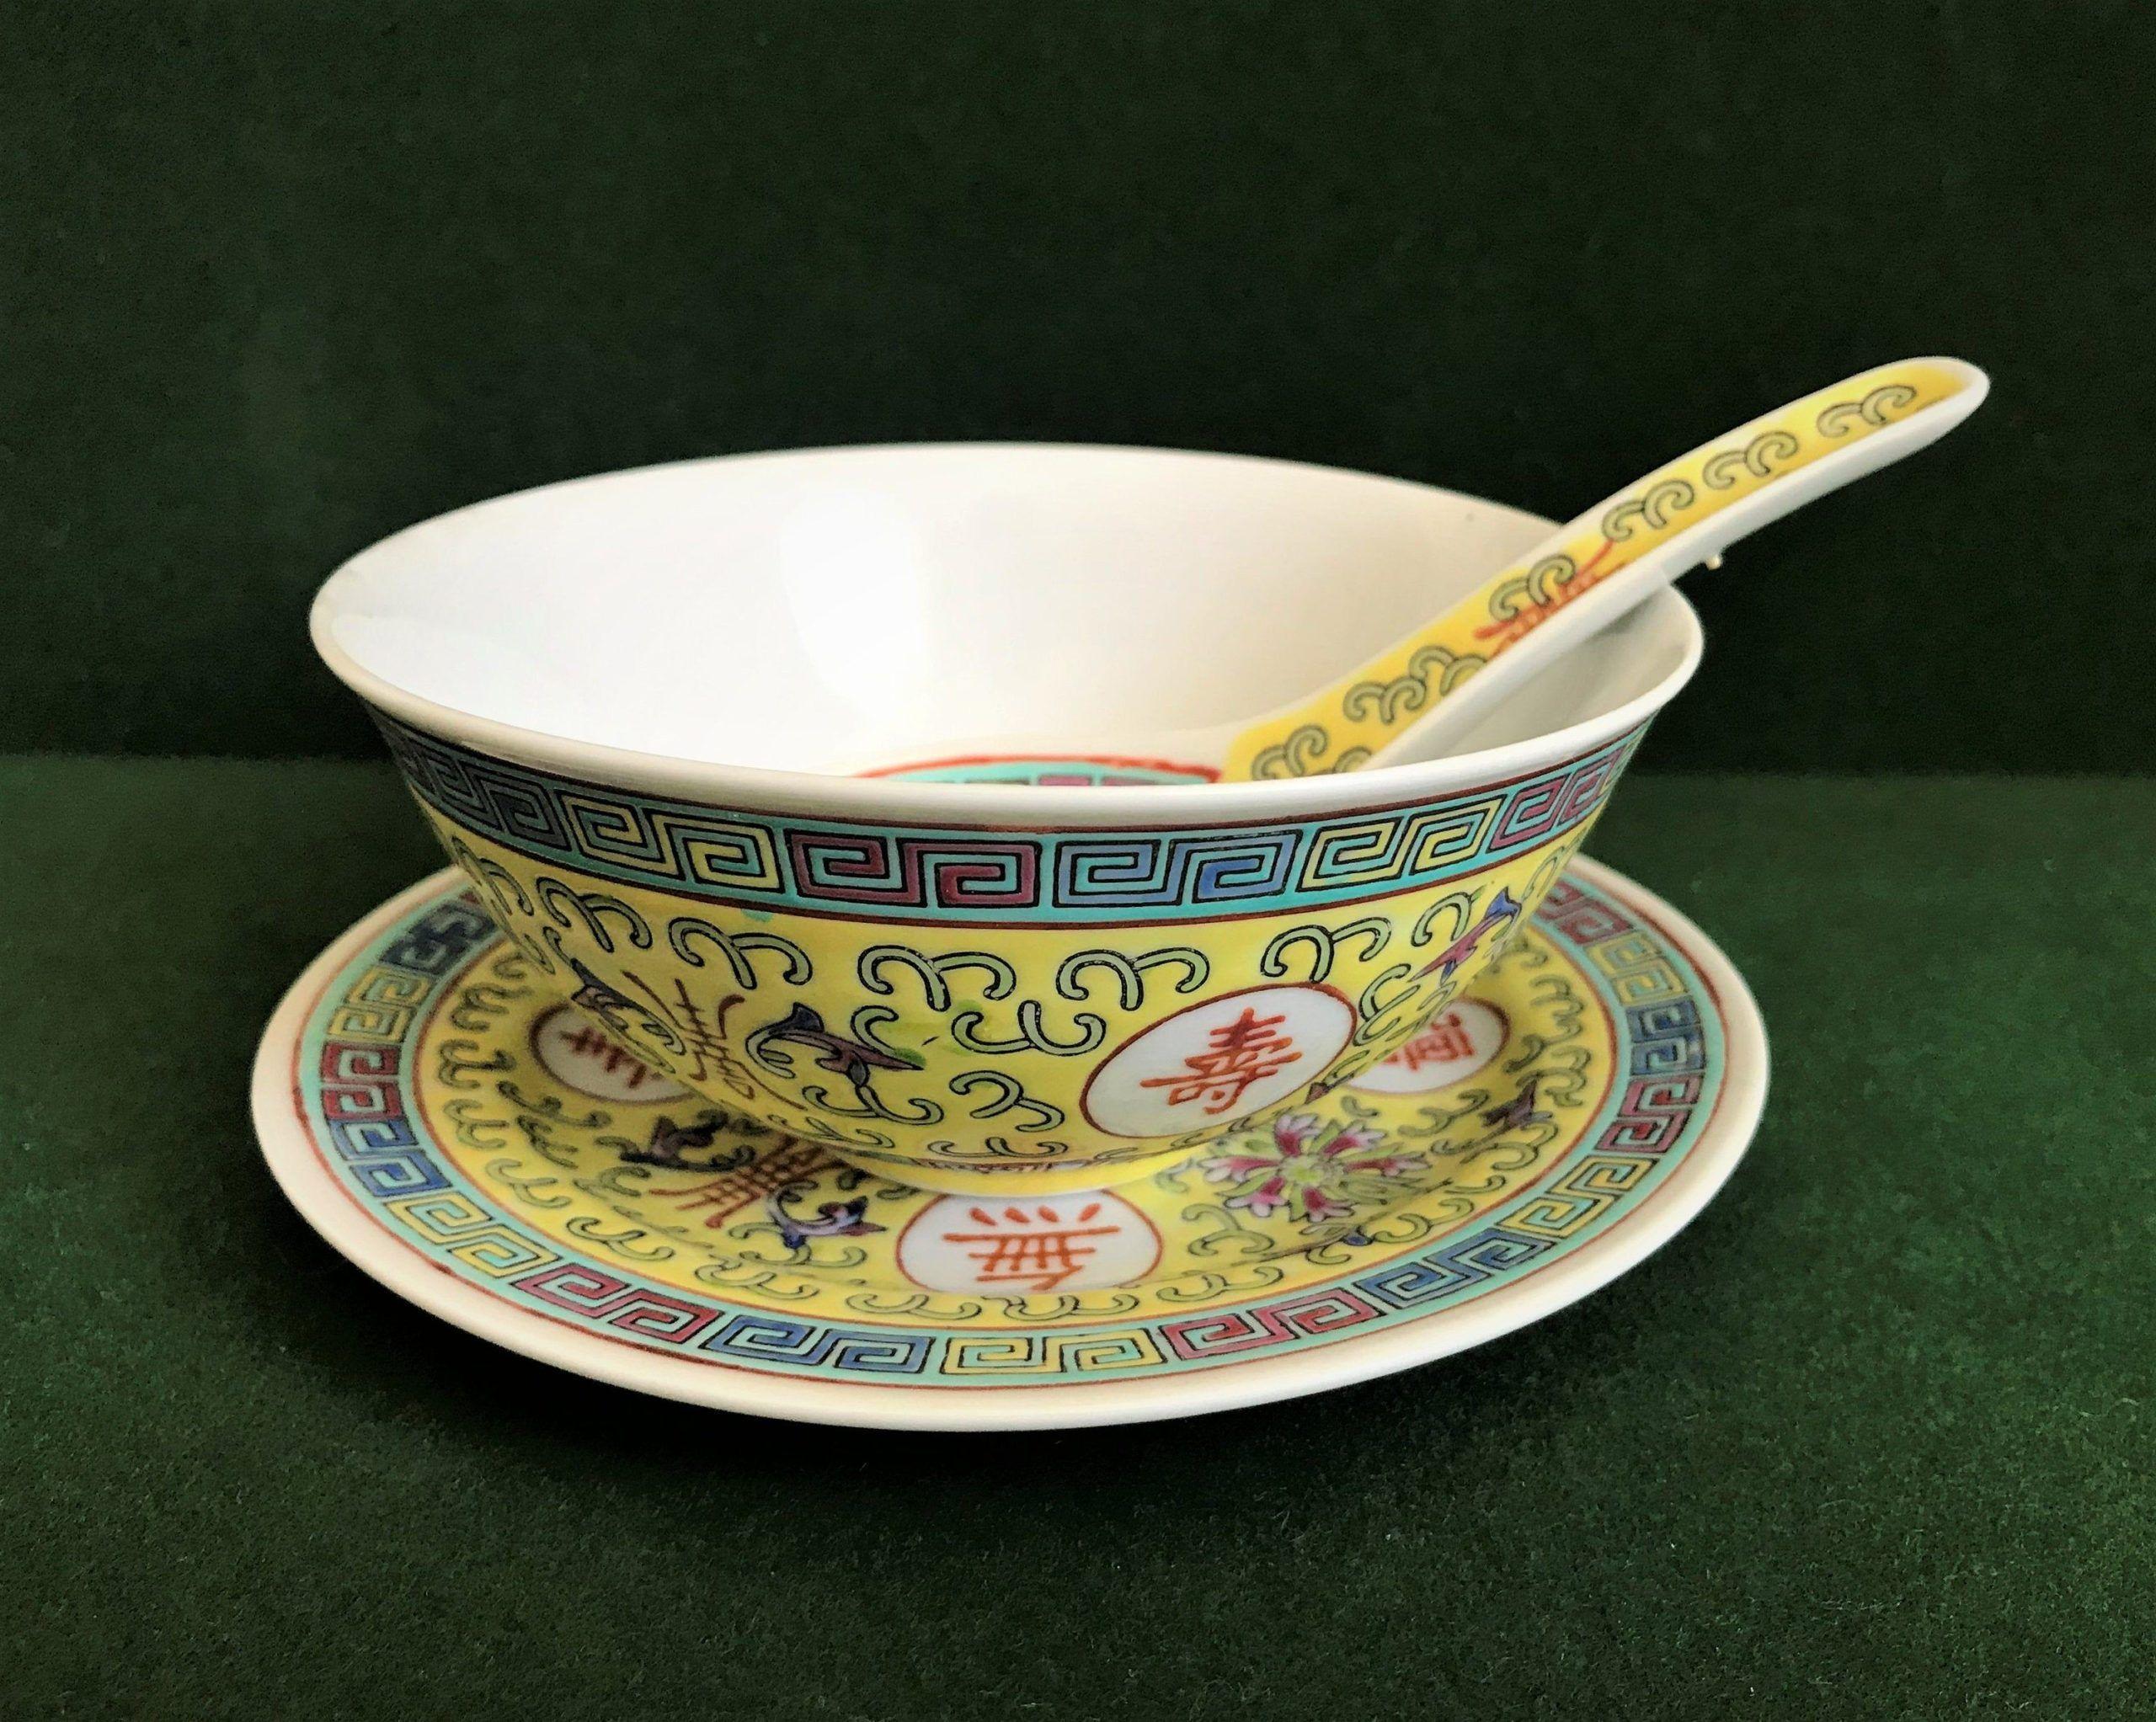 Vintage Chinese Soup Set Porzellan ... gesamt: 6 Set., #chinese #gesamt #Porzellan #Set #Soup #VINTAGE